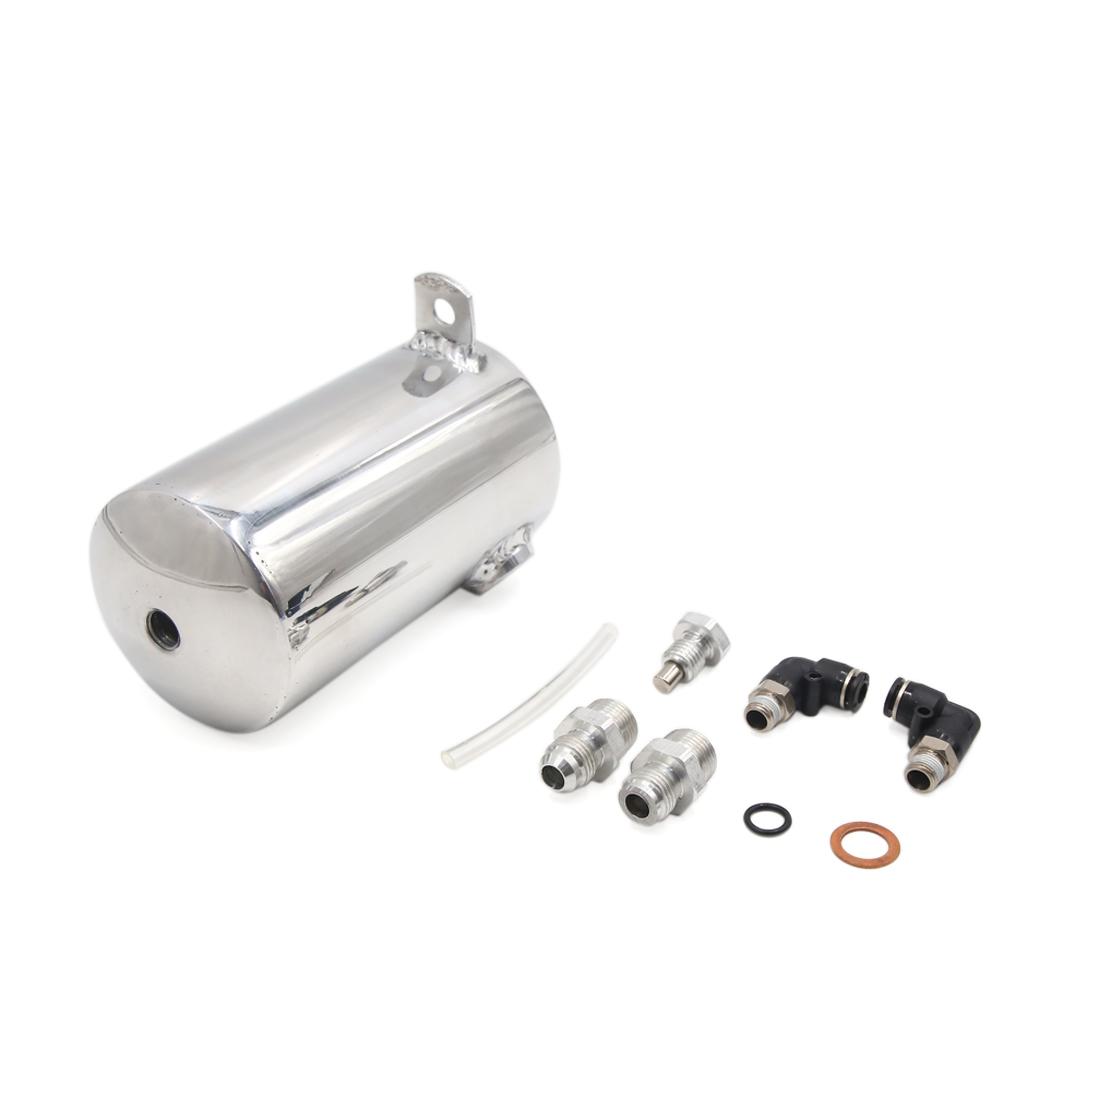 Universal 0.5L Silver Tone Car Coolant Overflow Radiator Water Tank Bottle Set